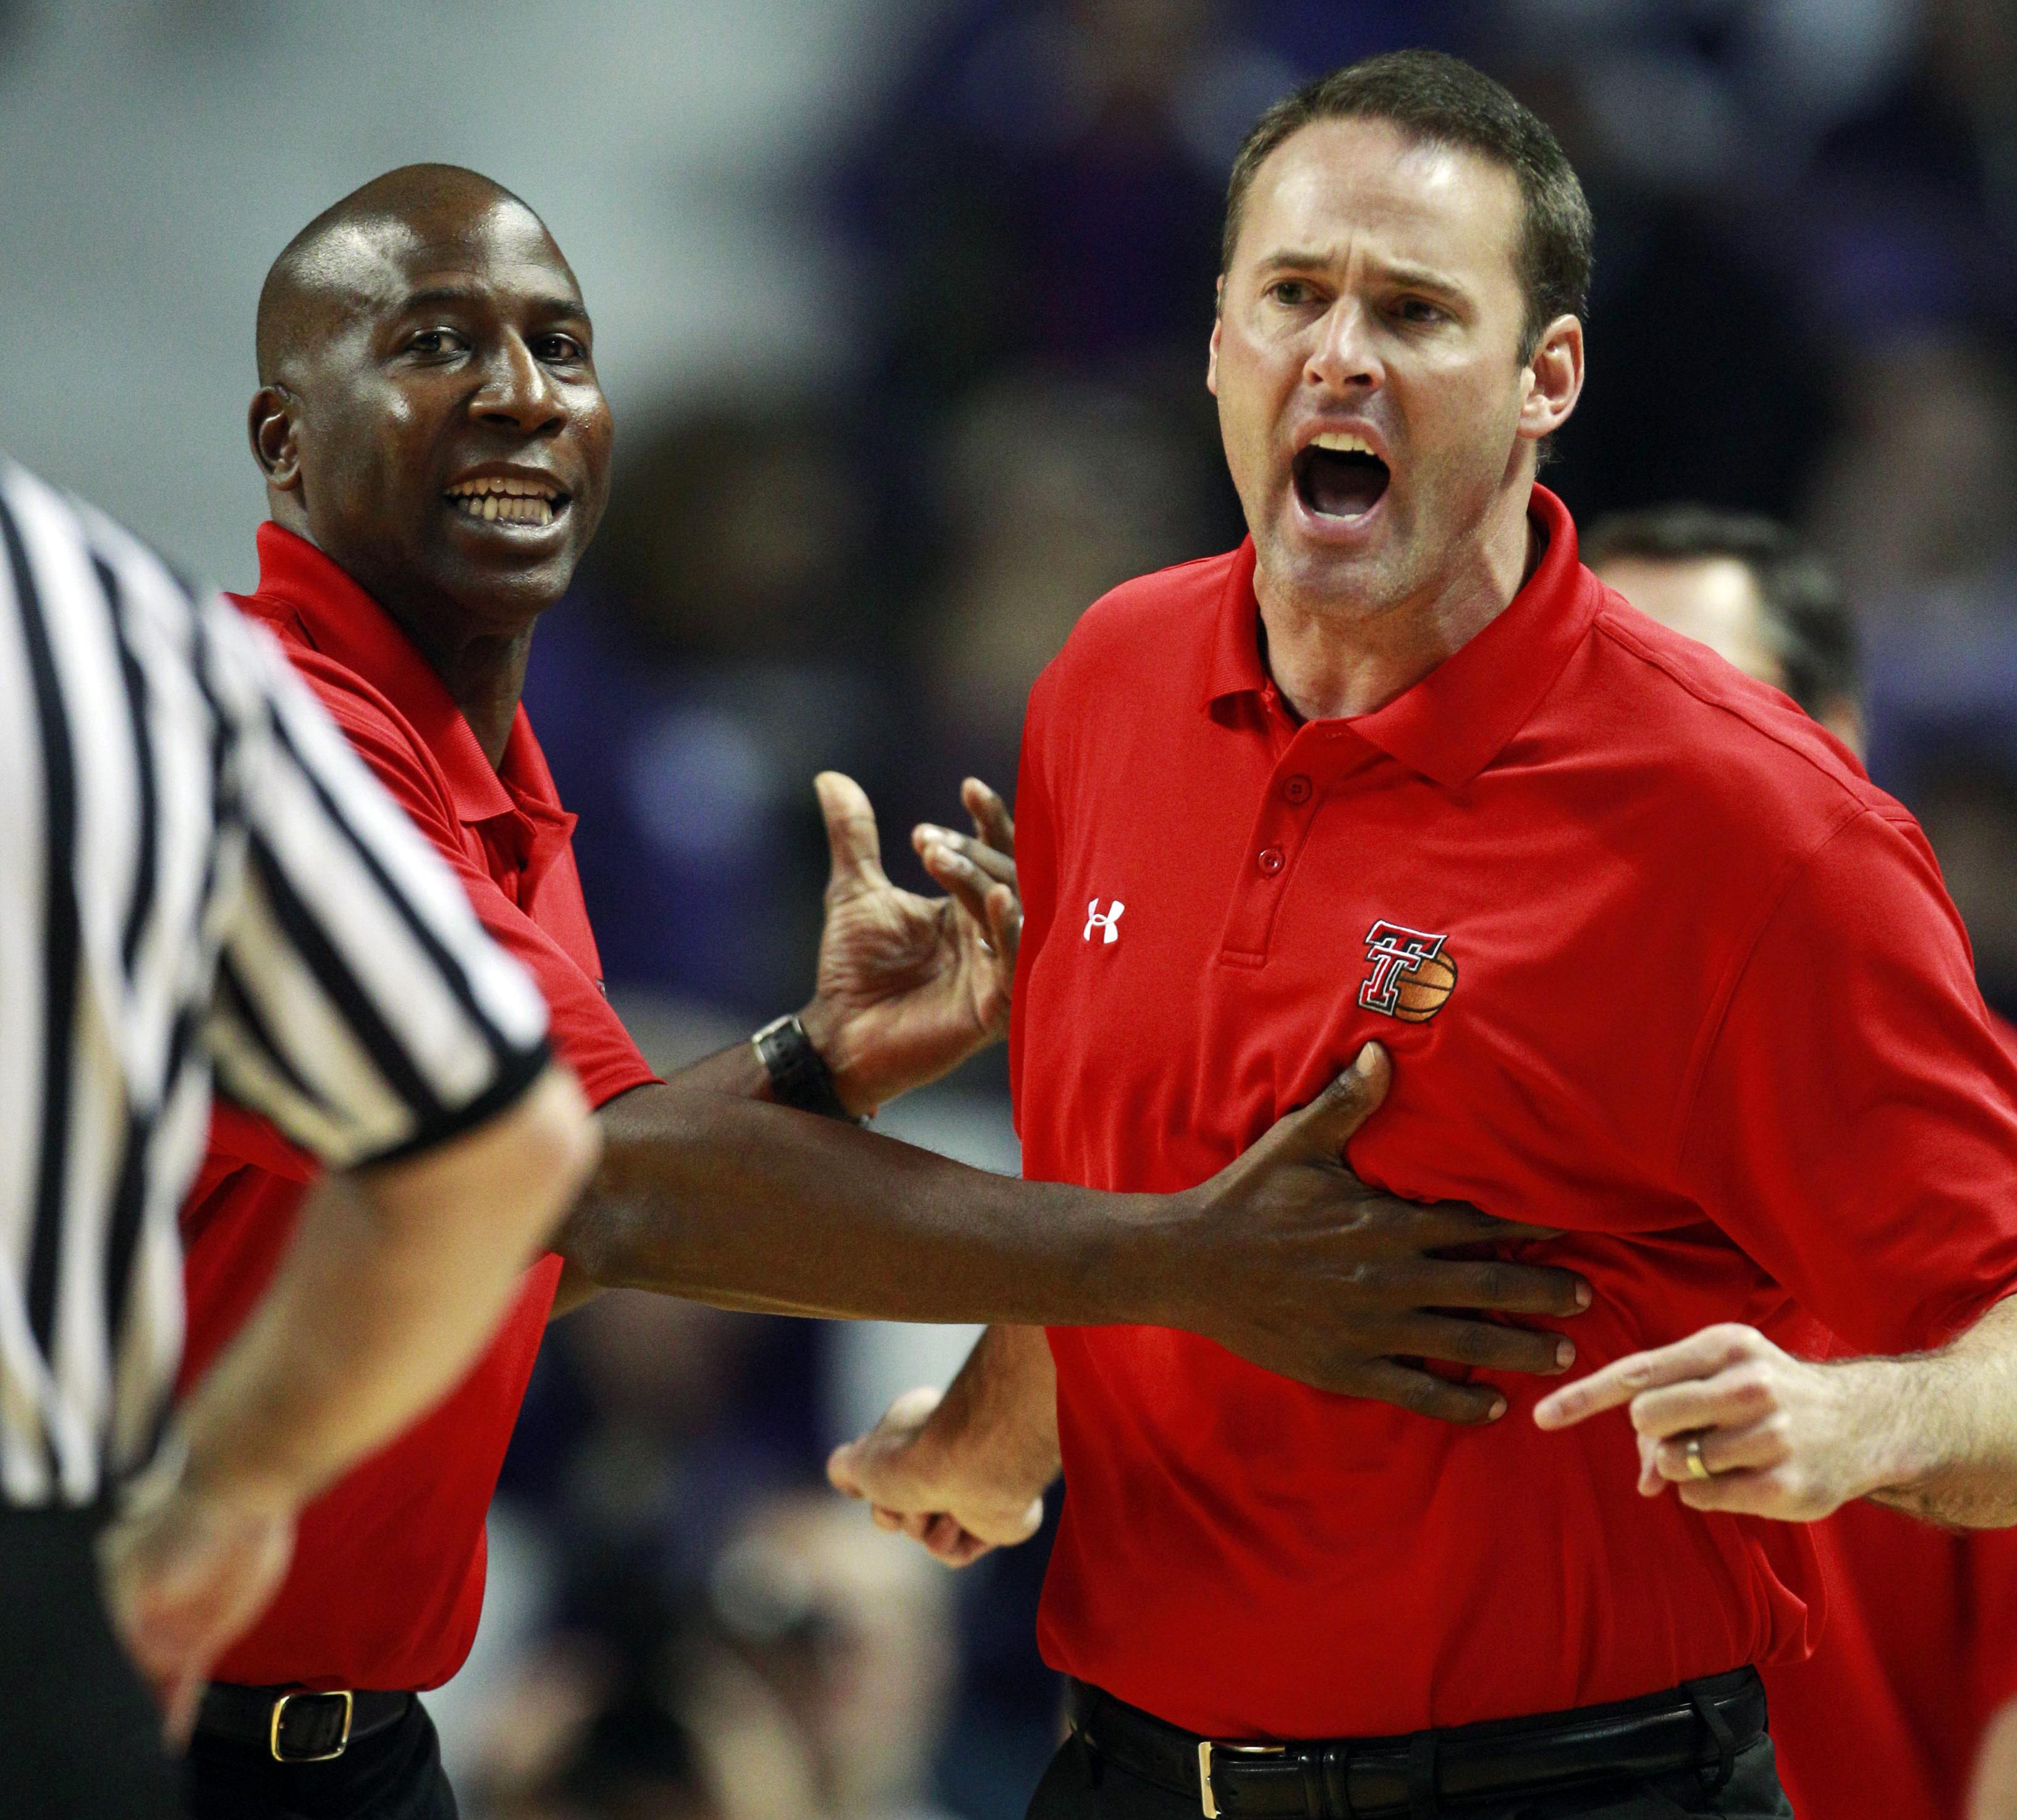 Pat Knight Fired As Coach At Texas Tech